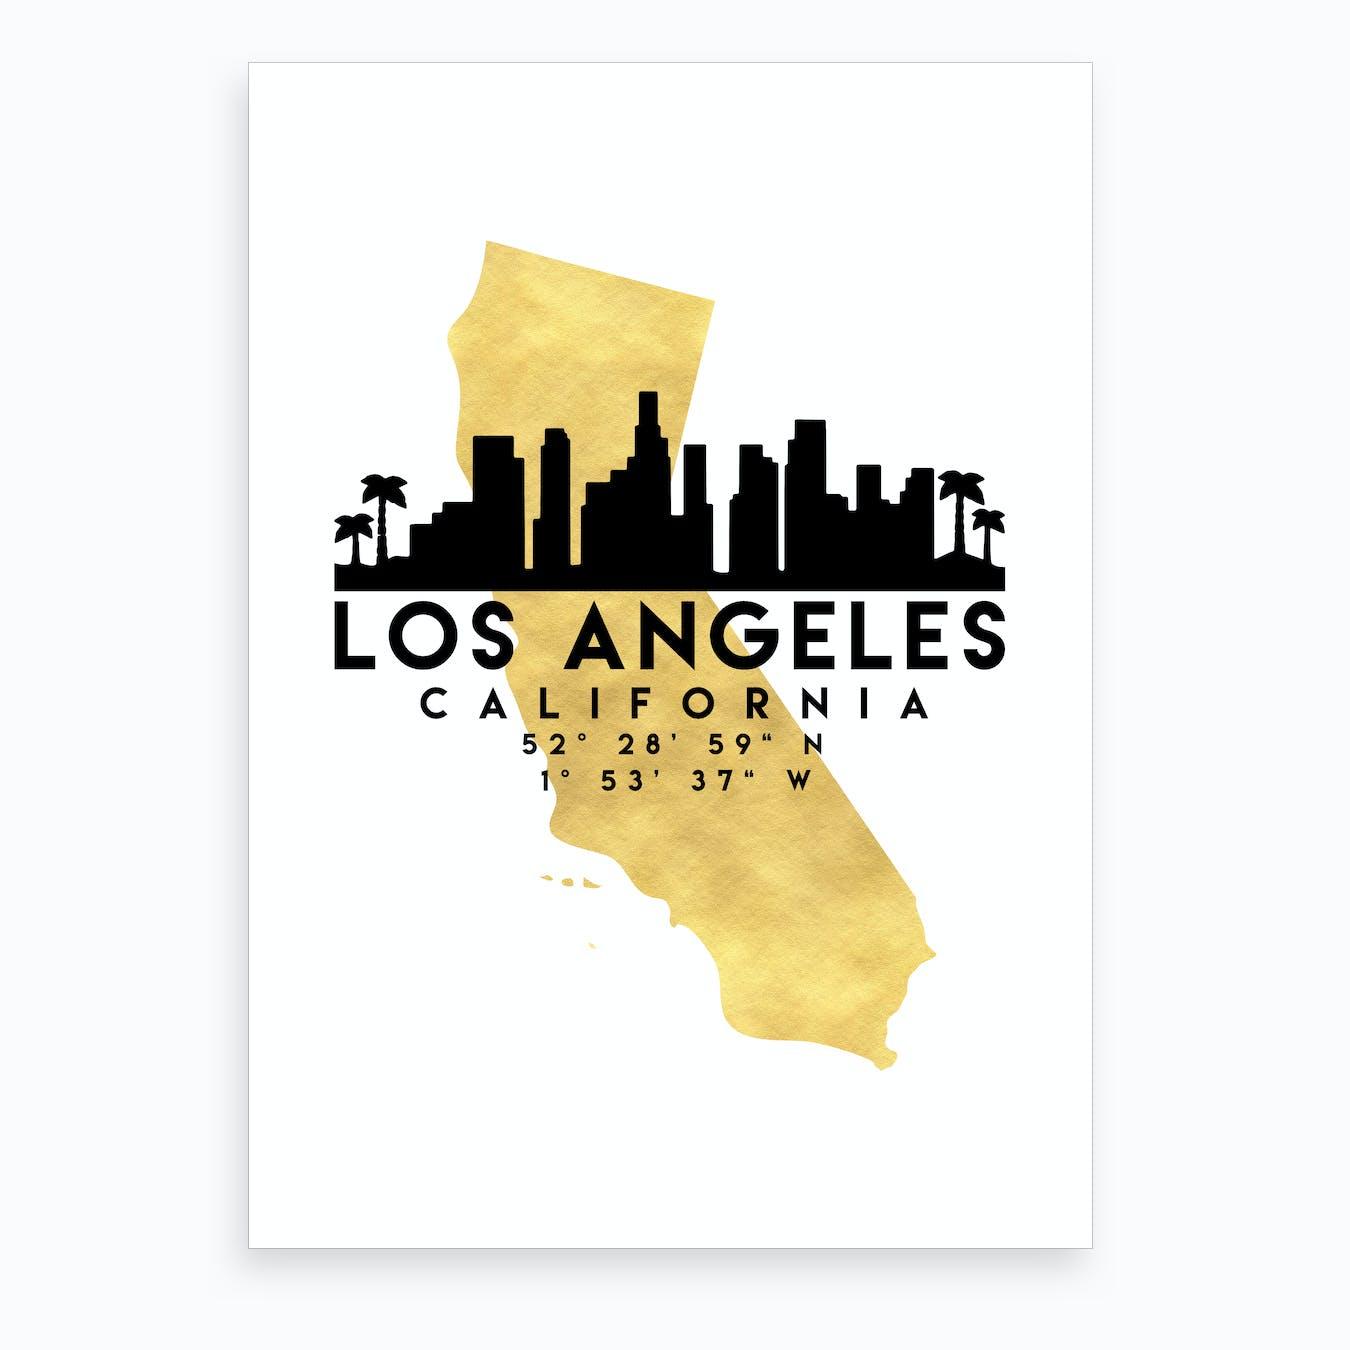 Los Angeles California Silhouette City Skyline Map